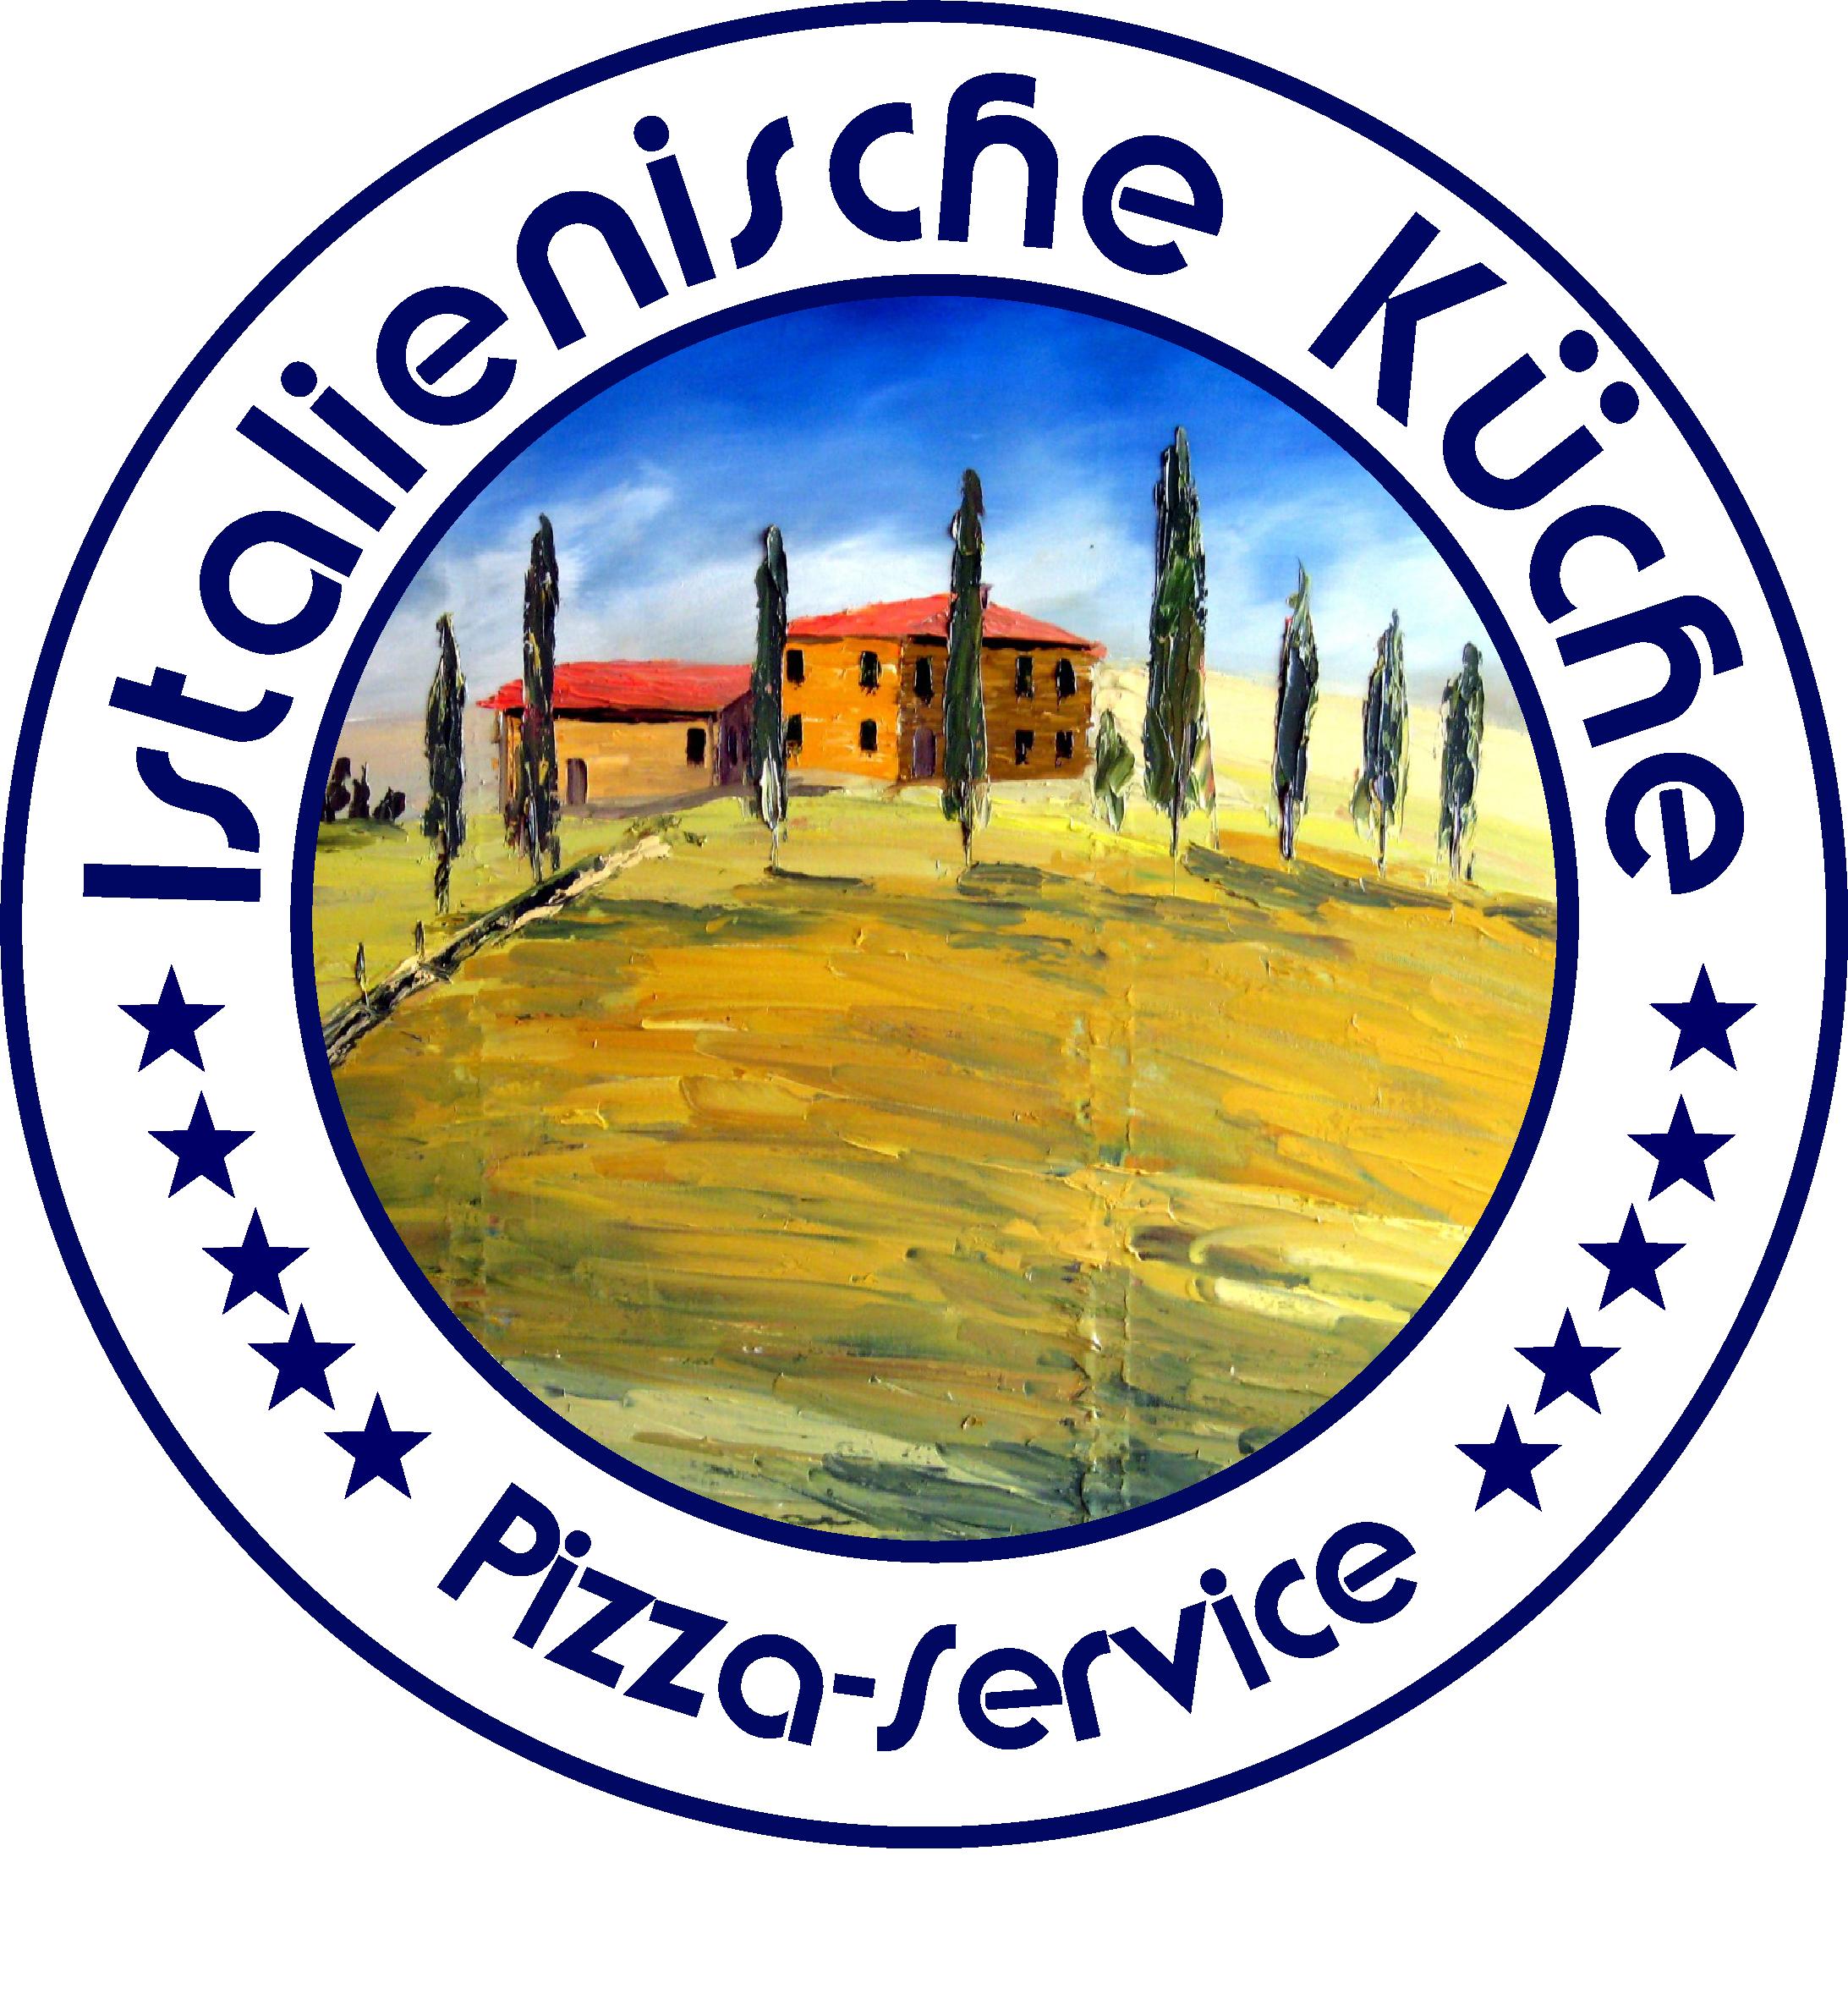 Logo italienische kueche pizza service toskana motiv sigillo ...